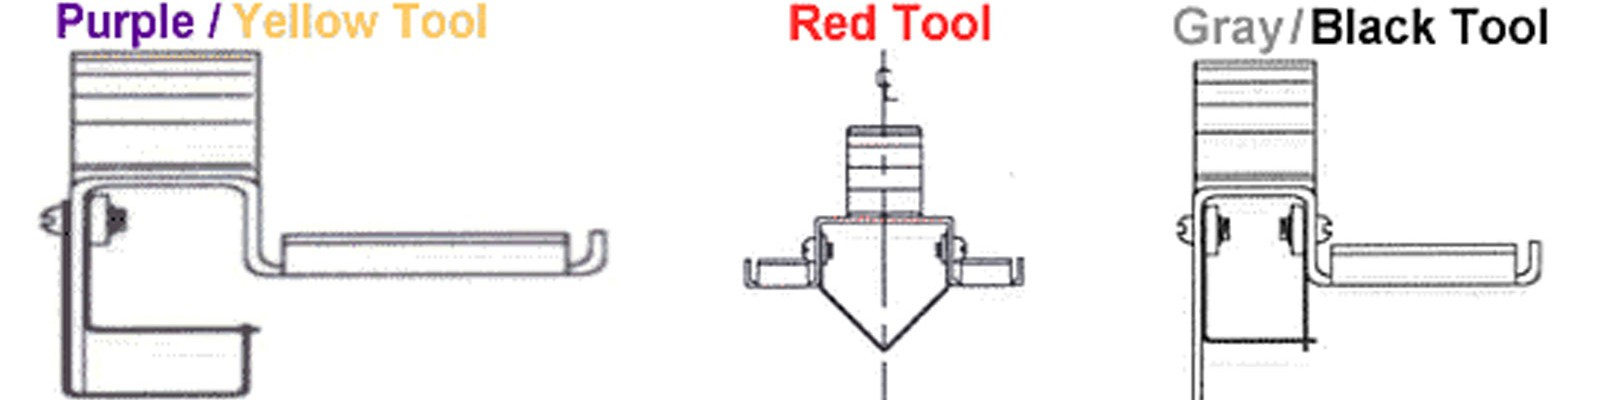 Amcraft Inc  – Duct Board Tools